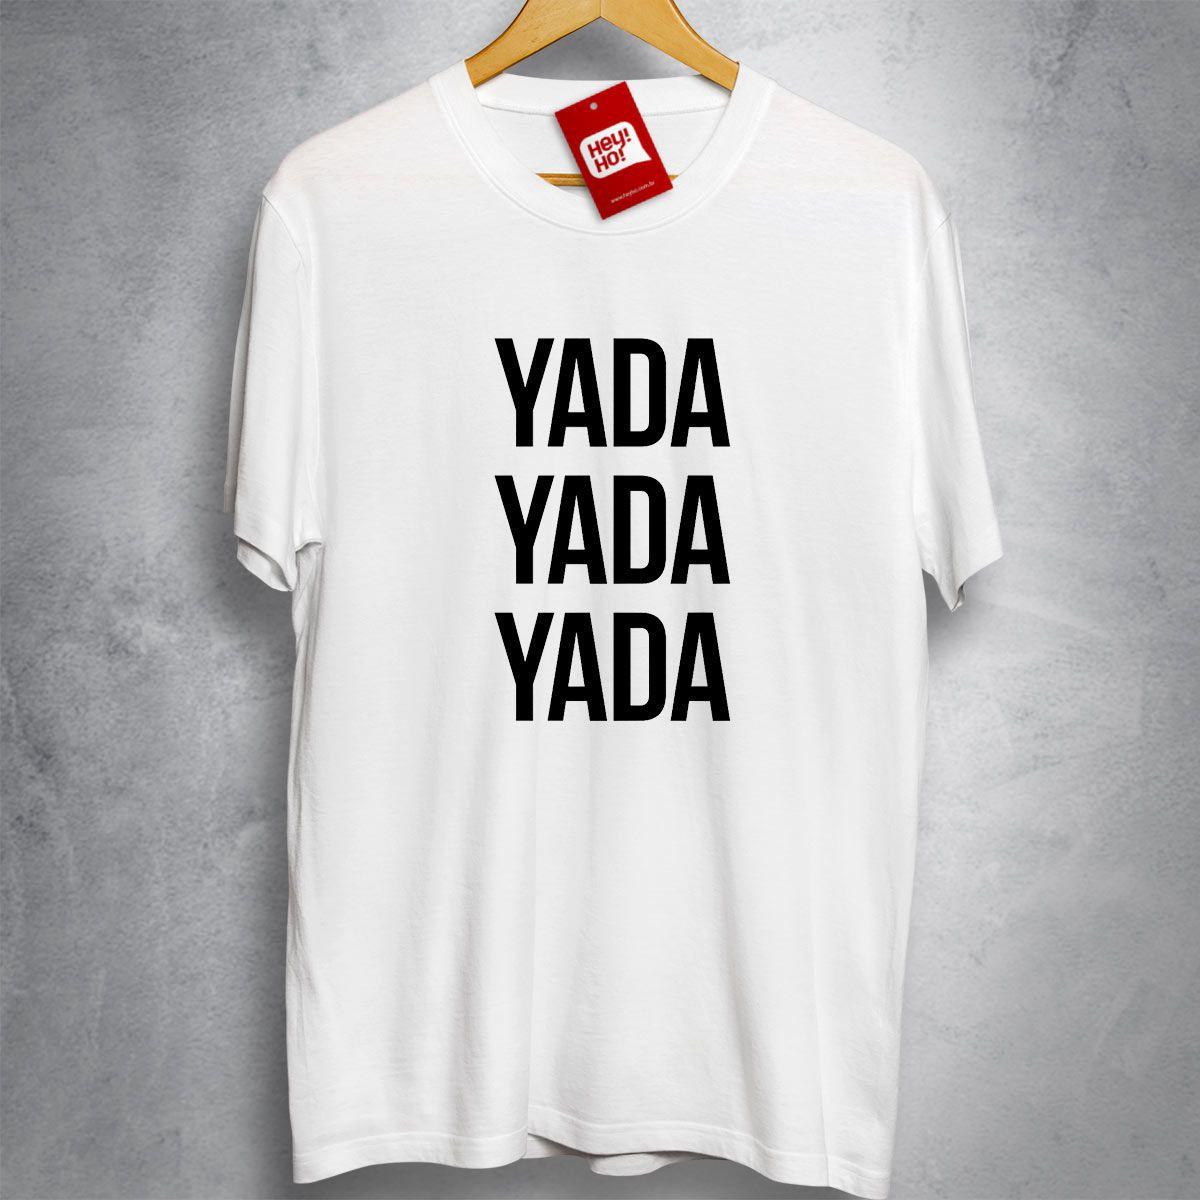 SEINFELD - Yada Yada Yada